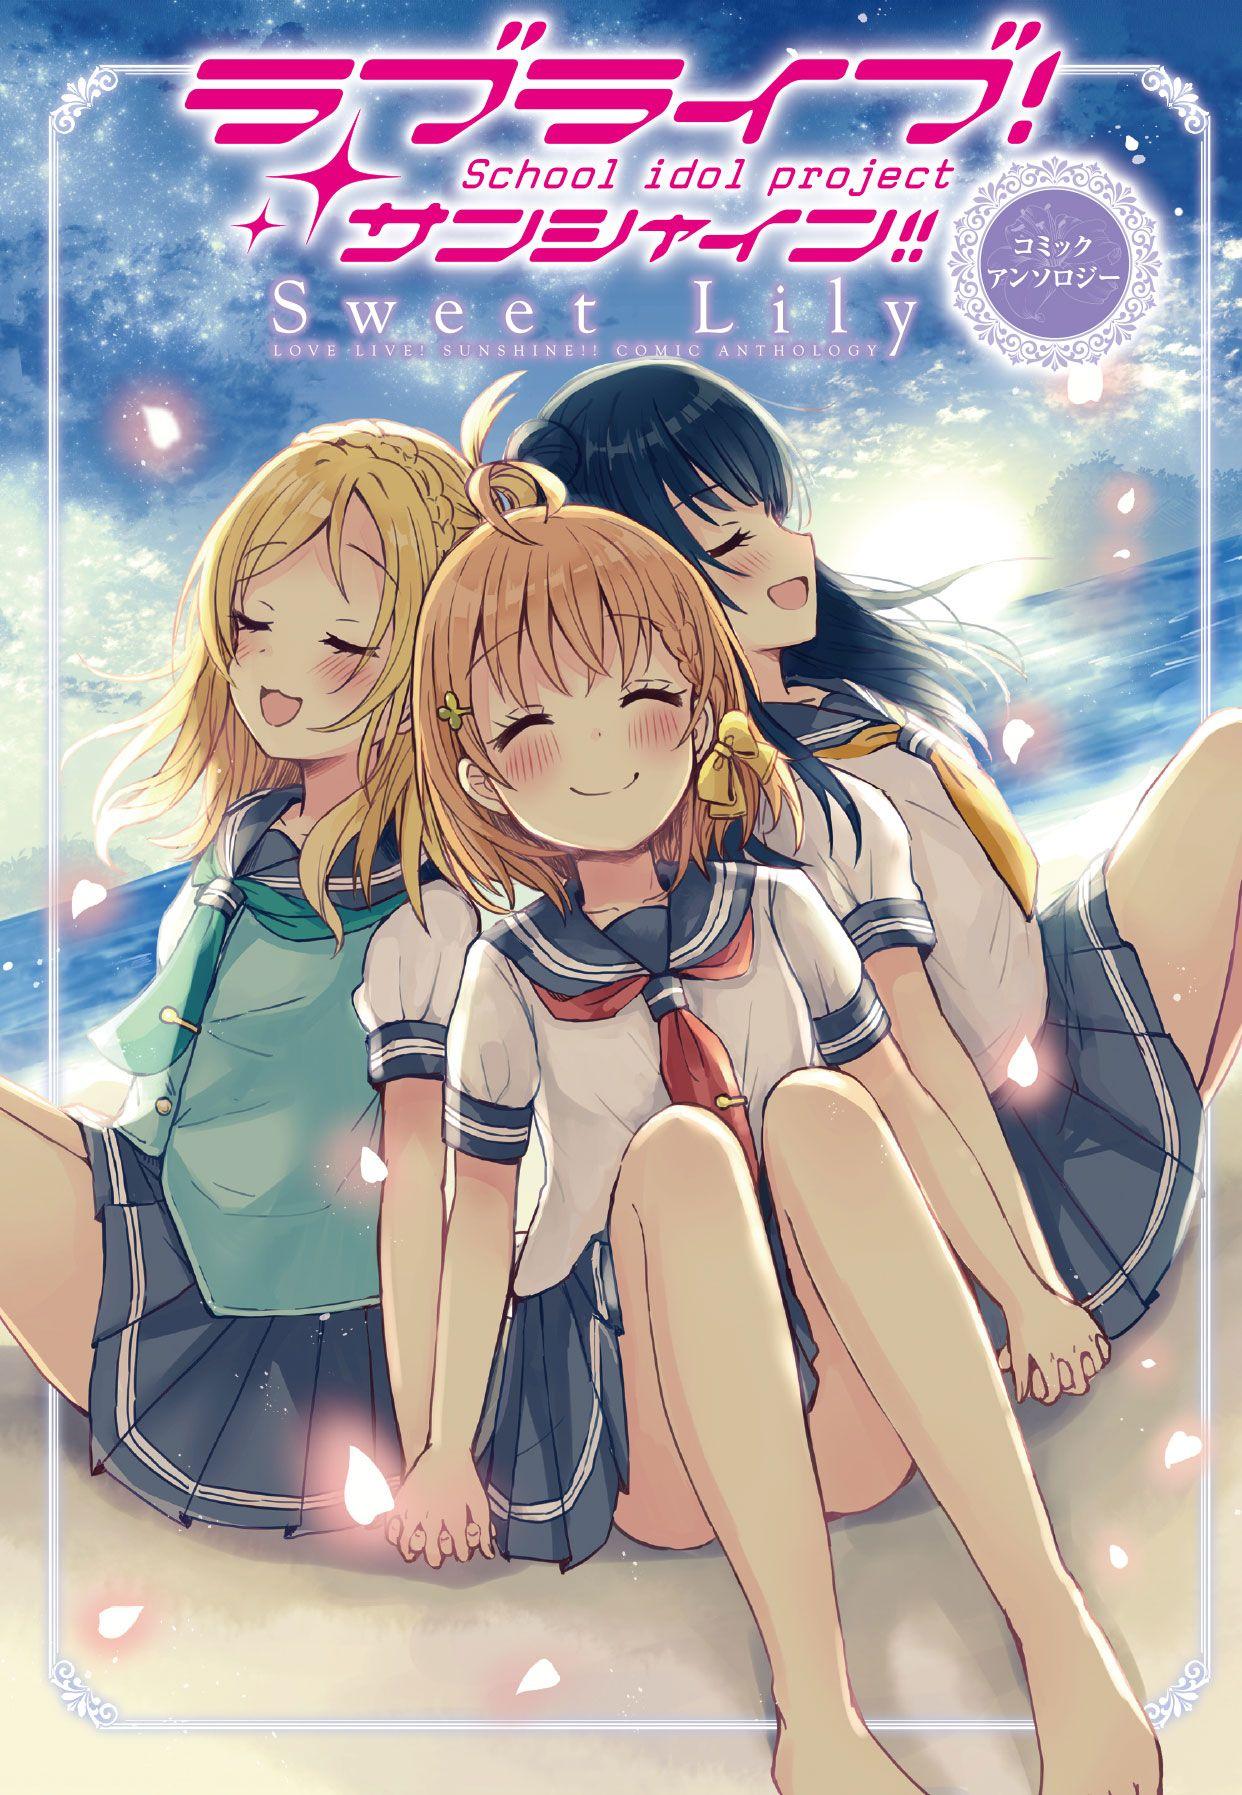 Pin by Melky Neko on Love Live ( Aqours ) Anime, Art